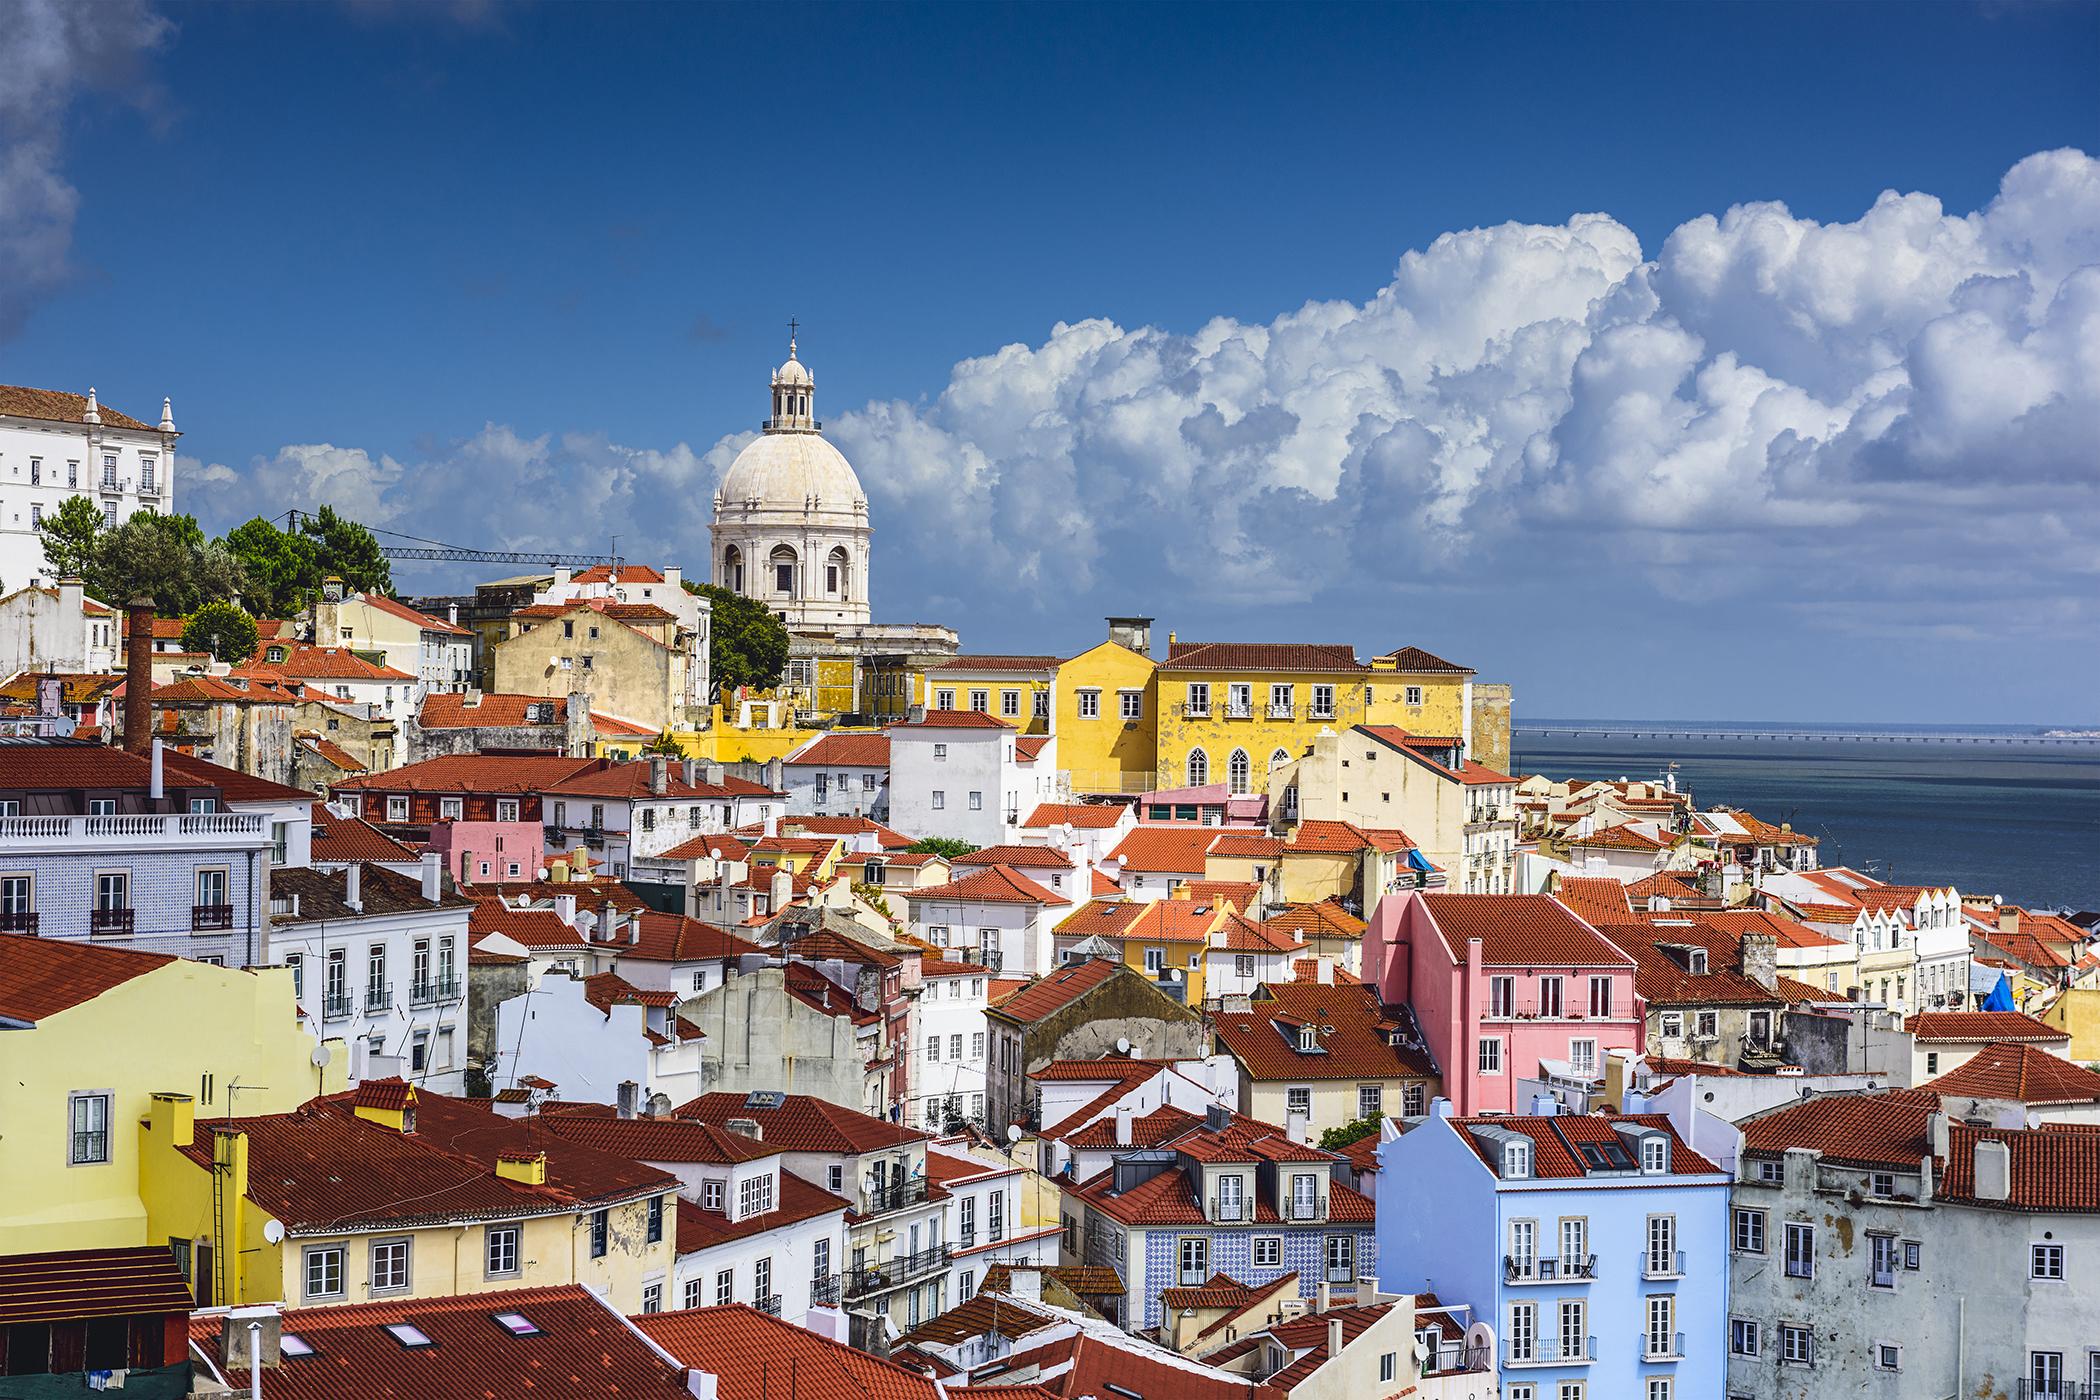 170407-europe-travel-lisbon